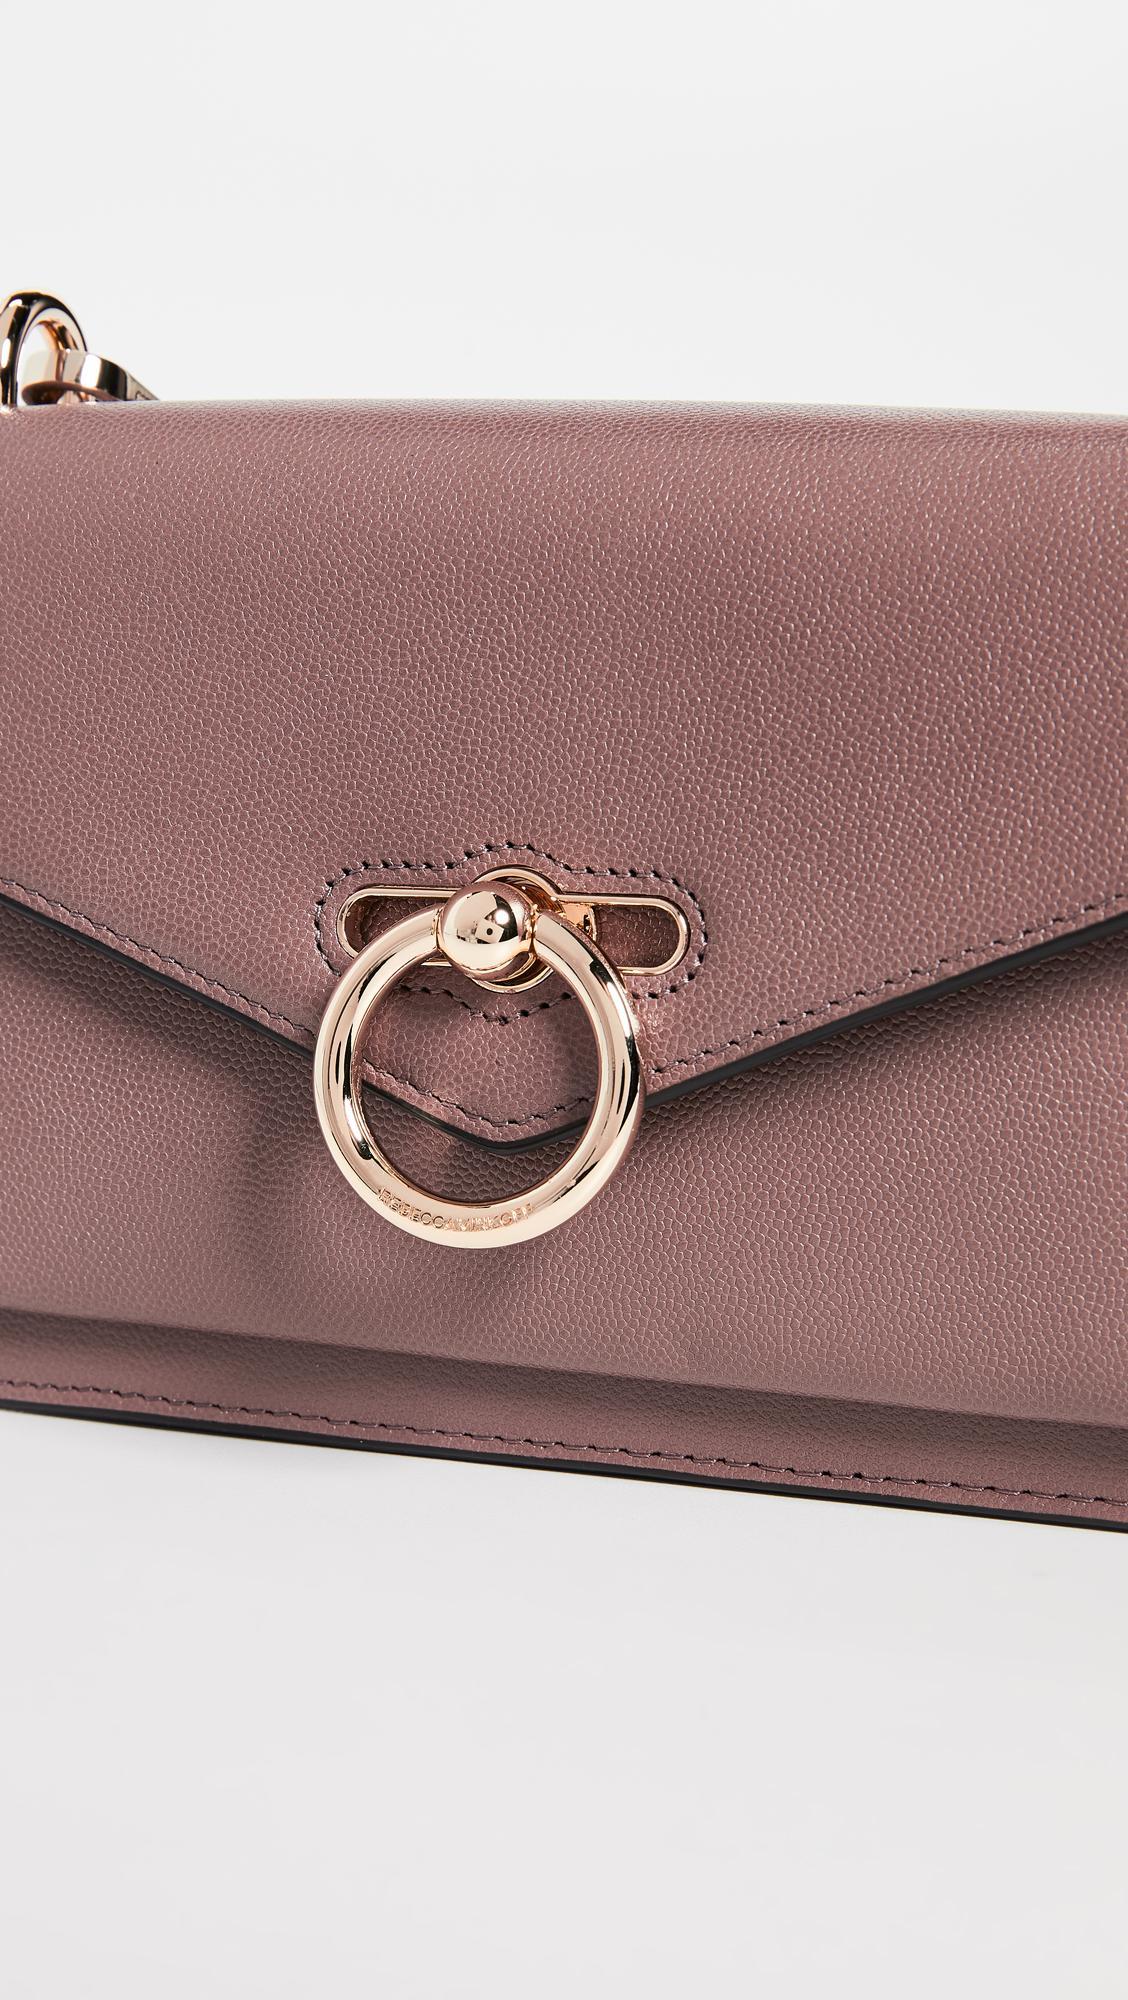 Rebecca Minkoff Leather Jean Crossbody Bag